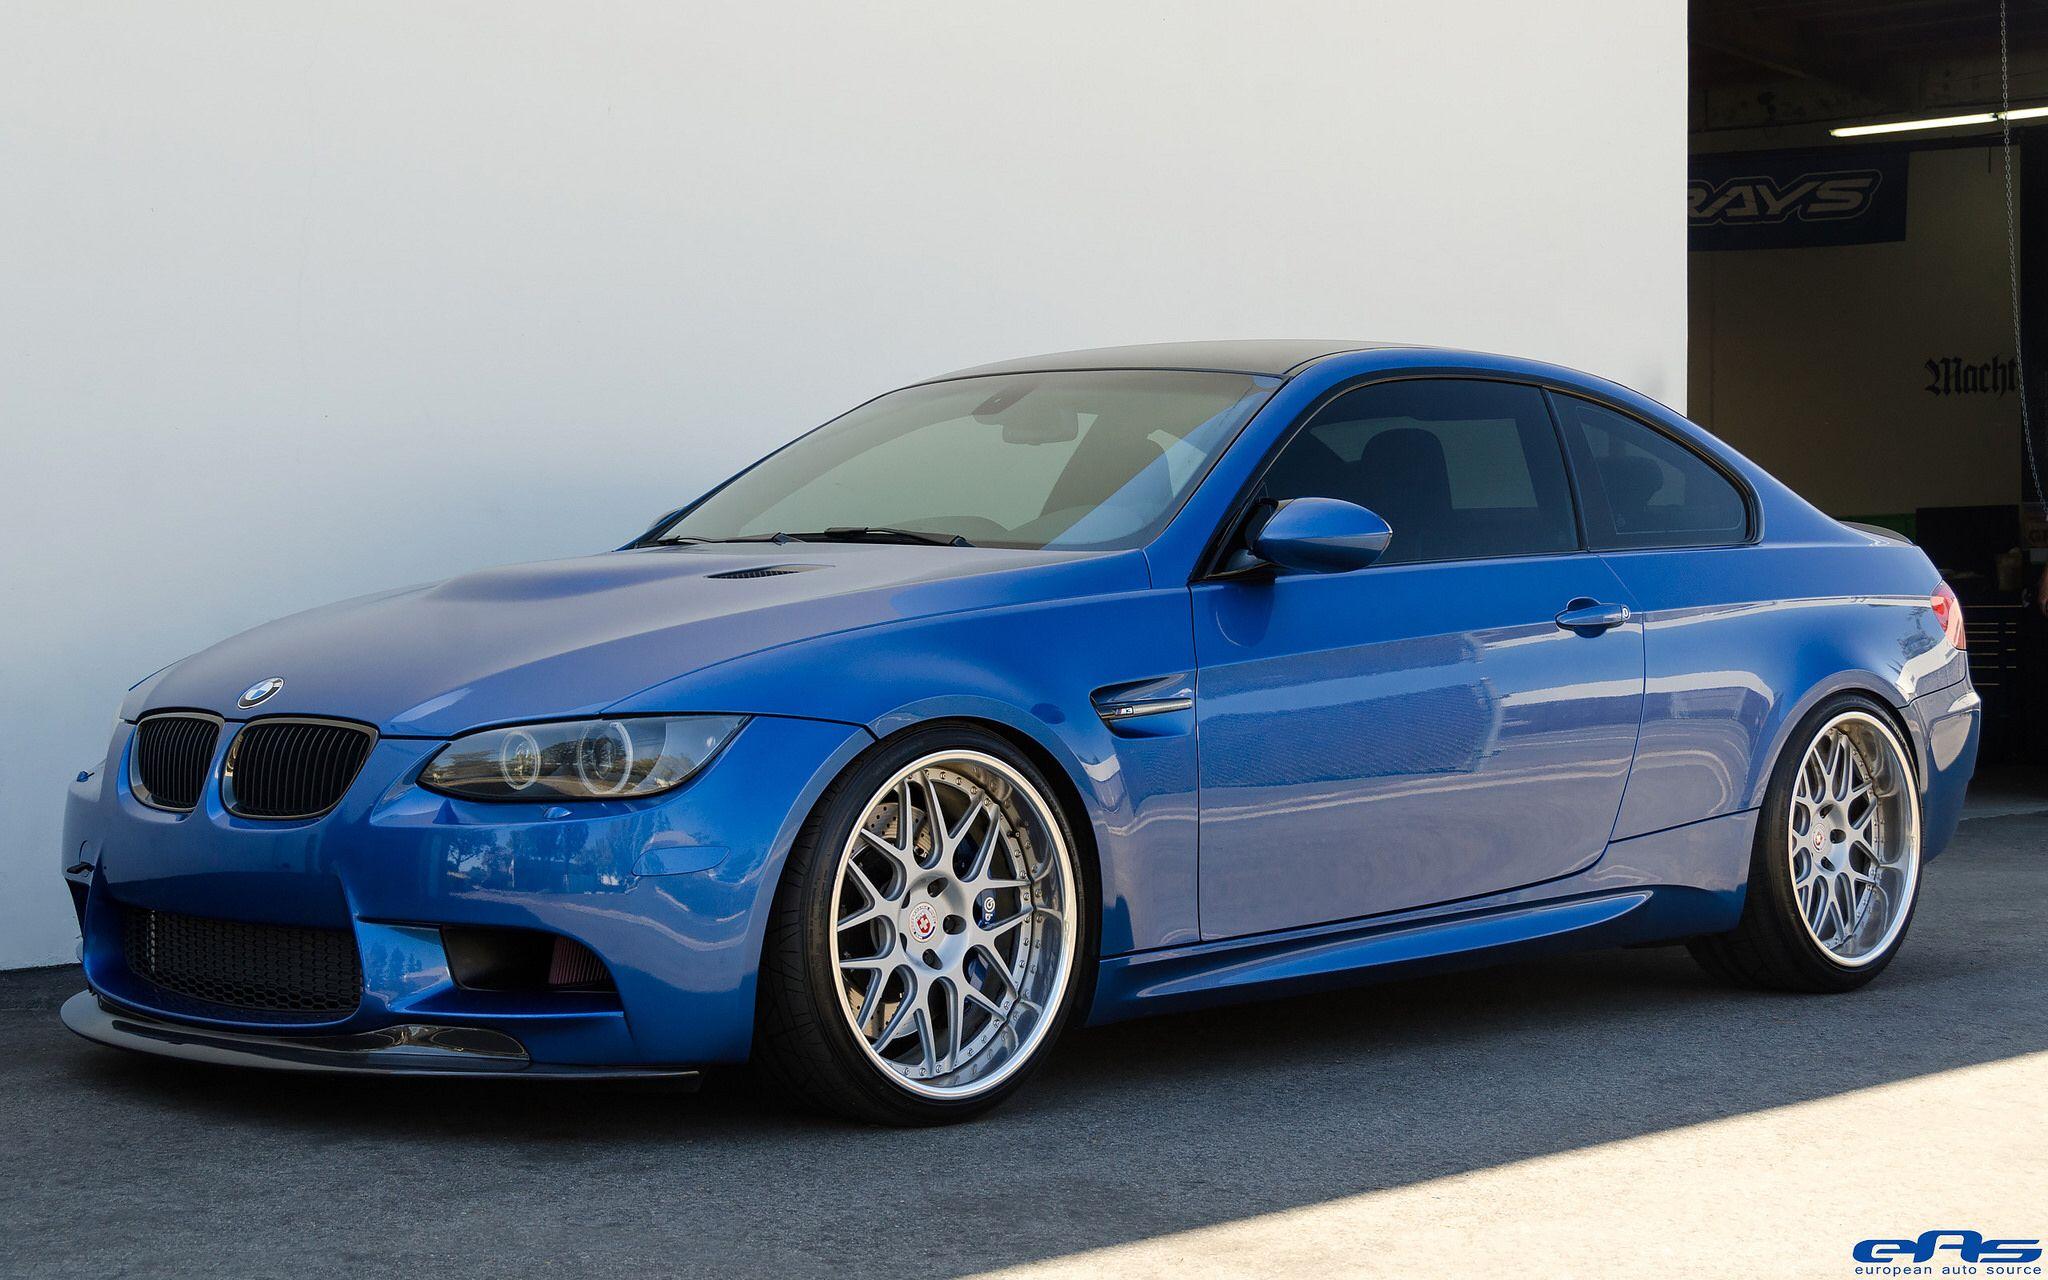 Frozen Blue Bmw E92 M3 In For Some Mods Bmw Custom Bmw Bmw Cars